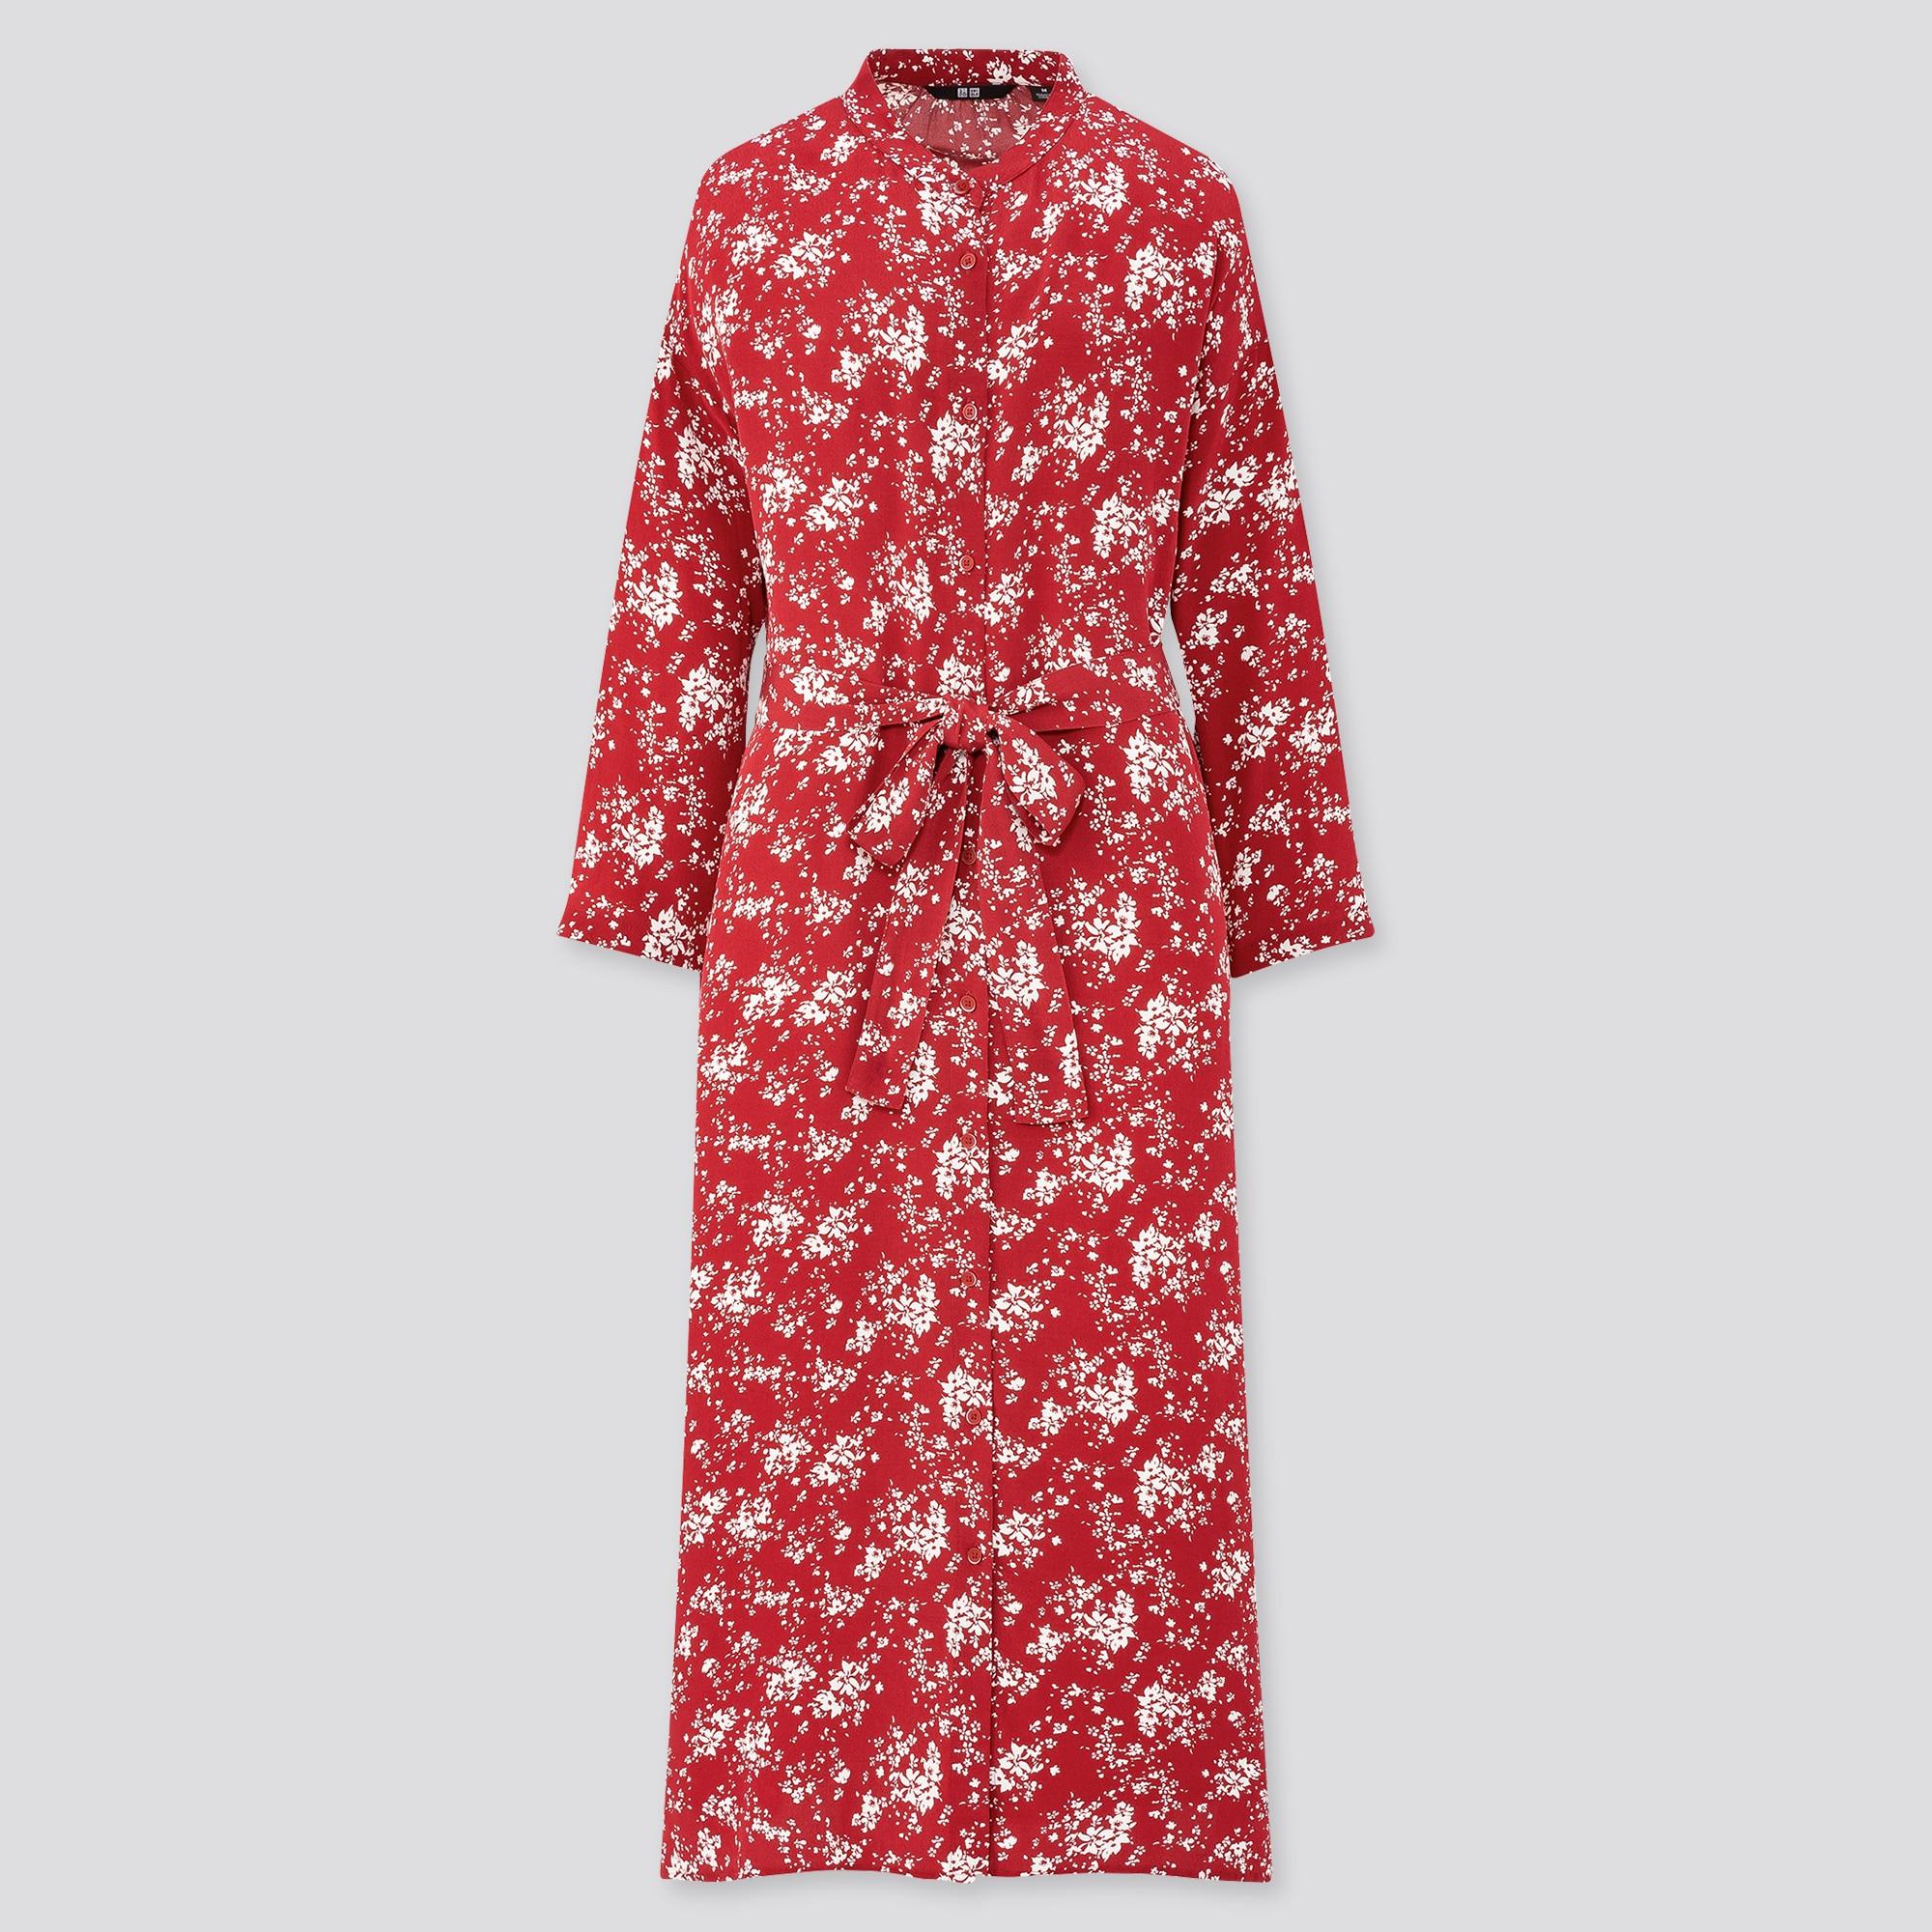 WOMEN PRINTED 3/4 SLEEVE SHIRT DRESS